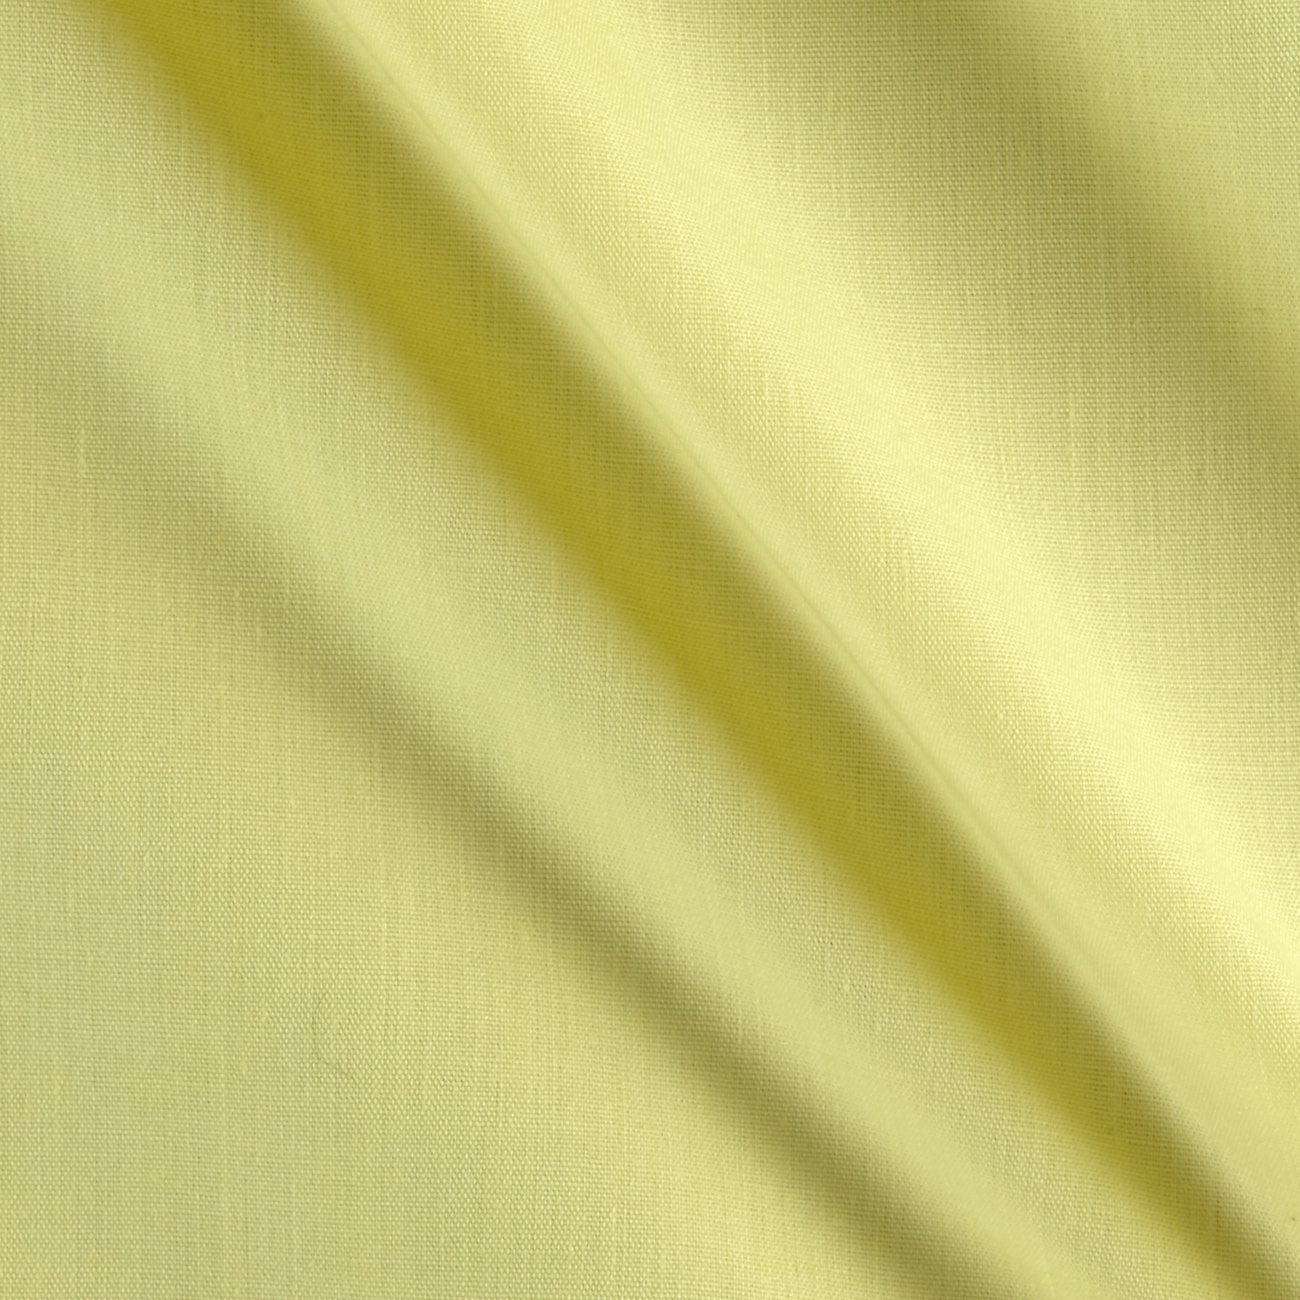 "Ben Textiles 60"" Poly Cotton Broadcloth, Yard, Light Yellow"